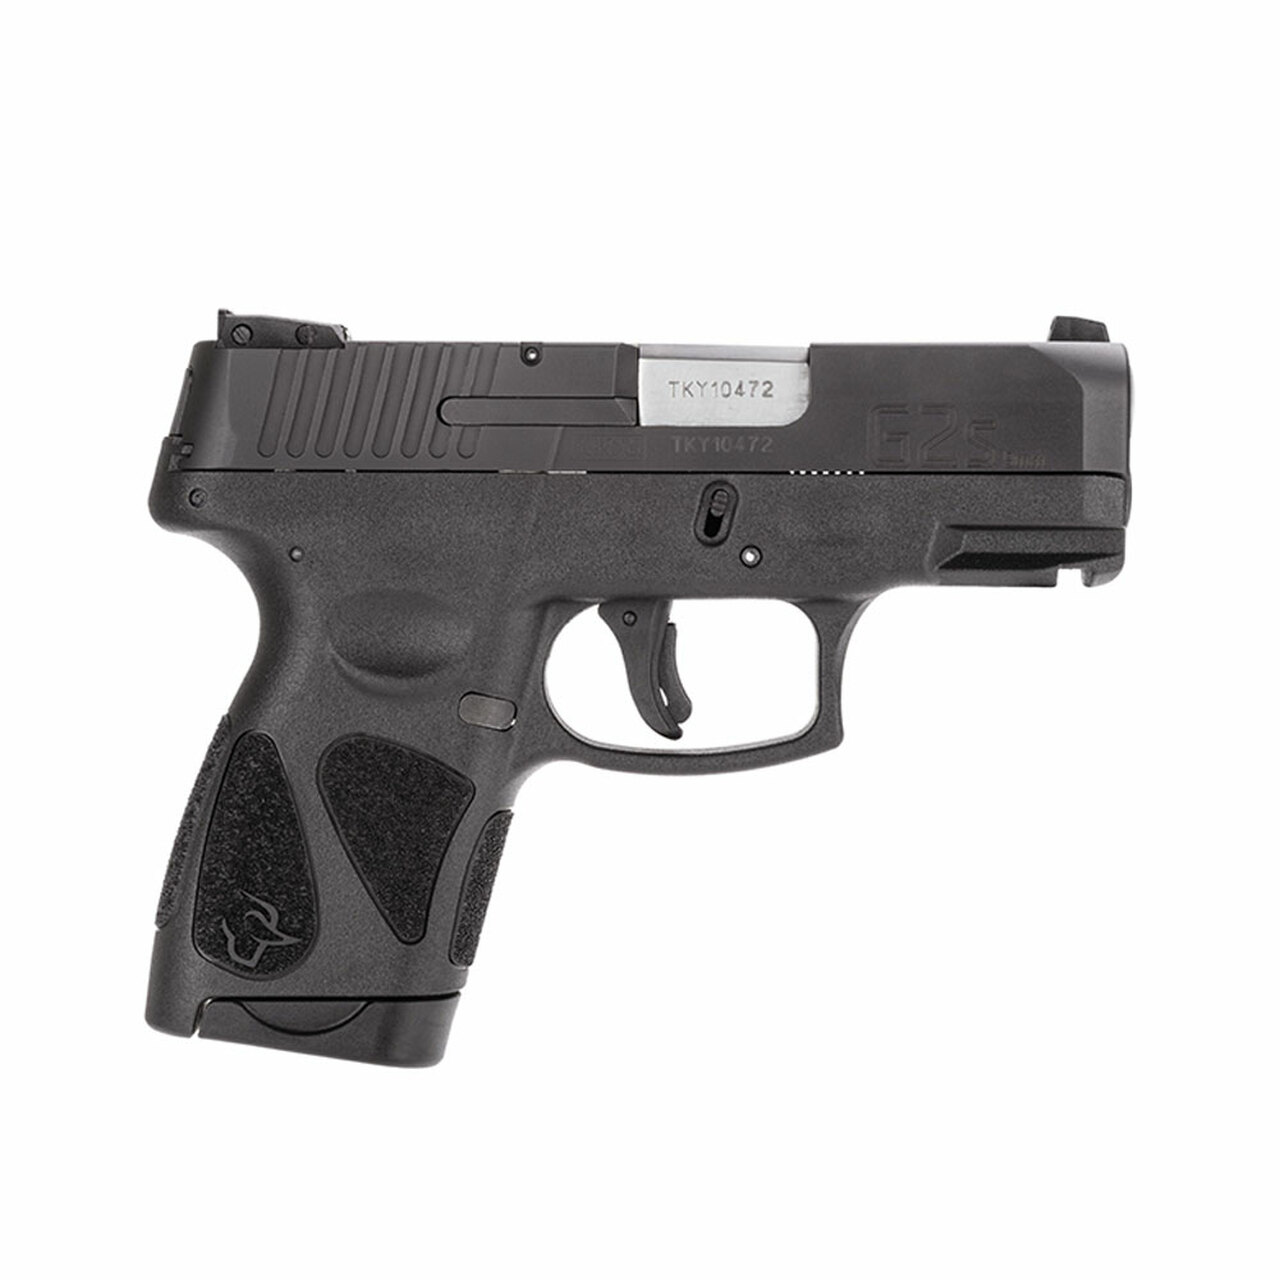 TAURUS G2S 9mm 3 25in 7rd Semi-Automatic Pistol (1-G2S931)